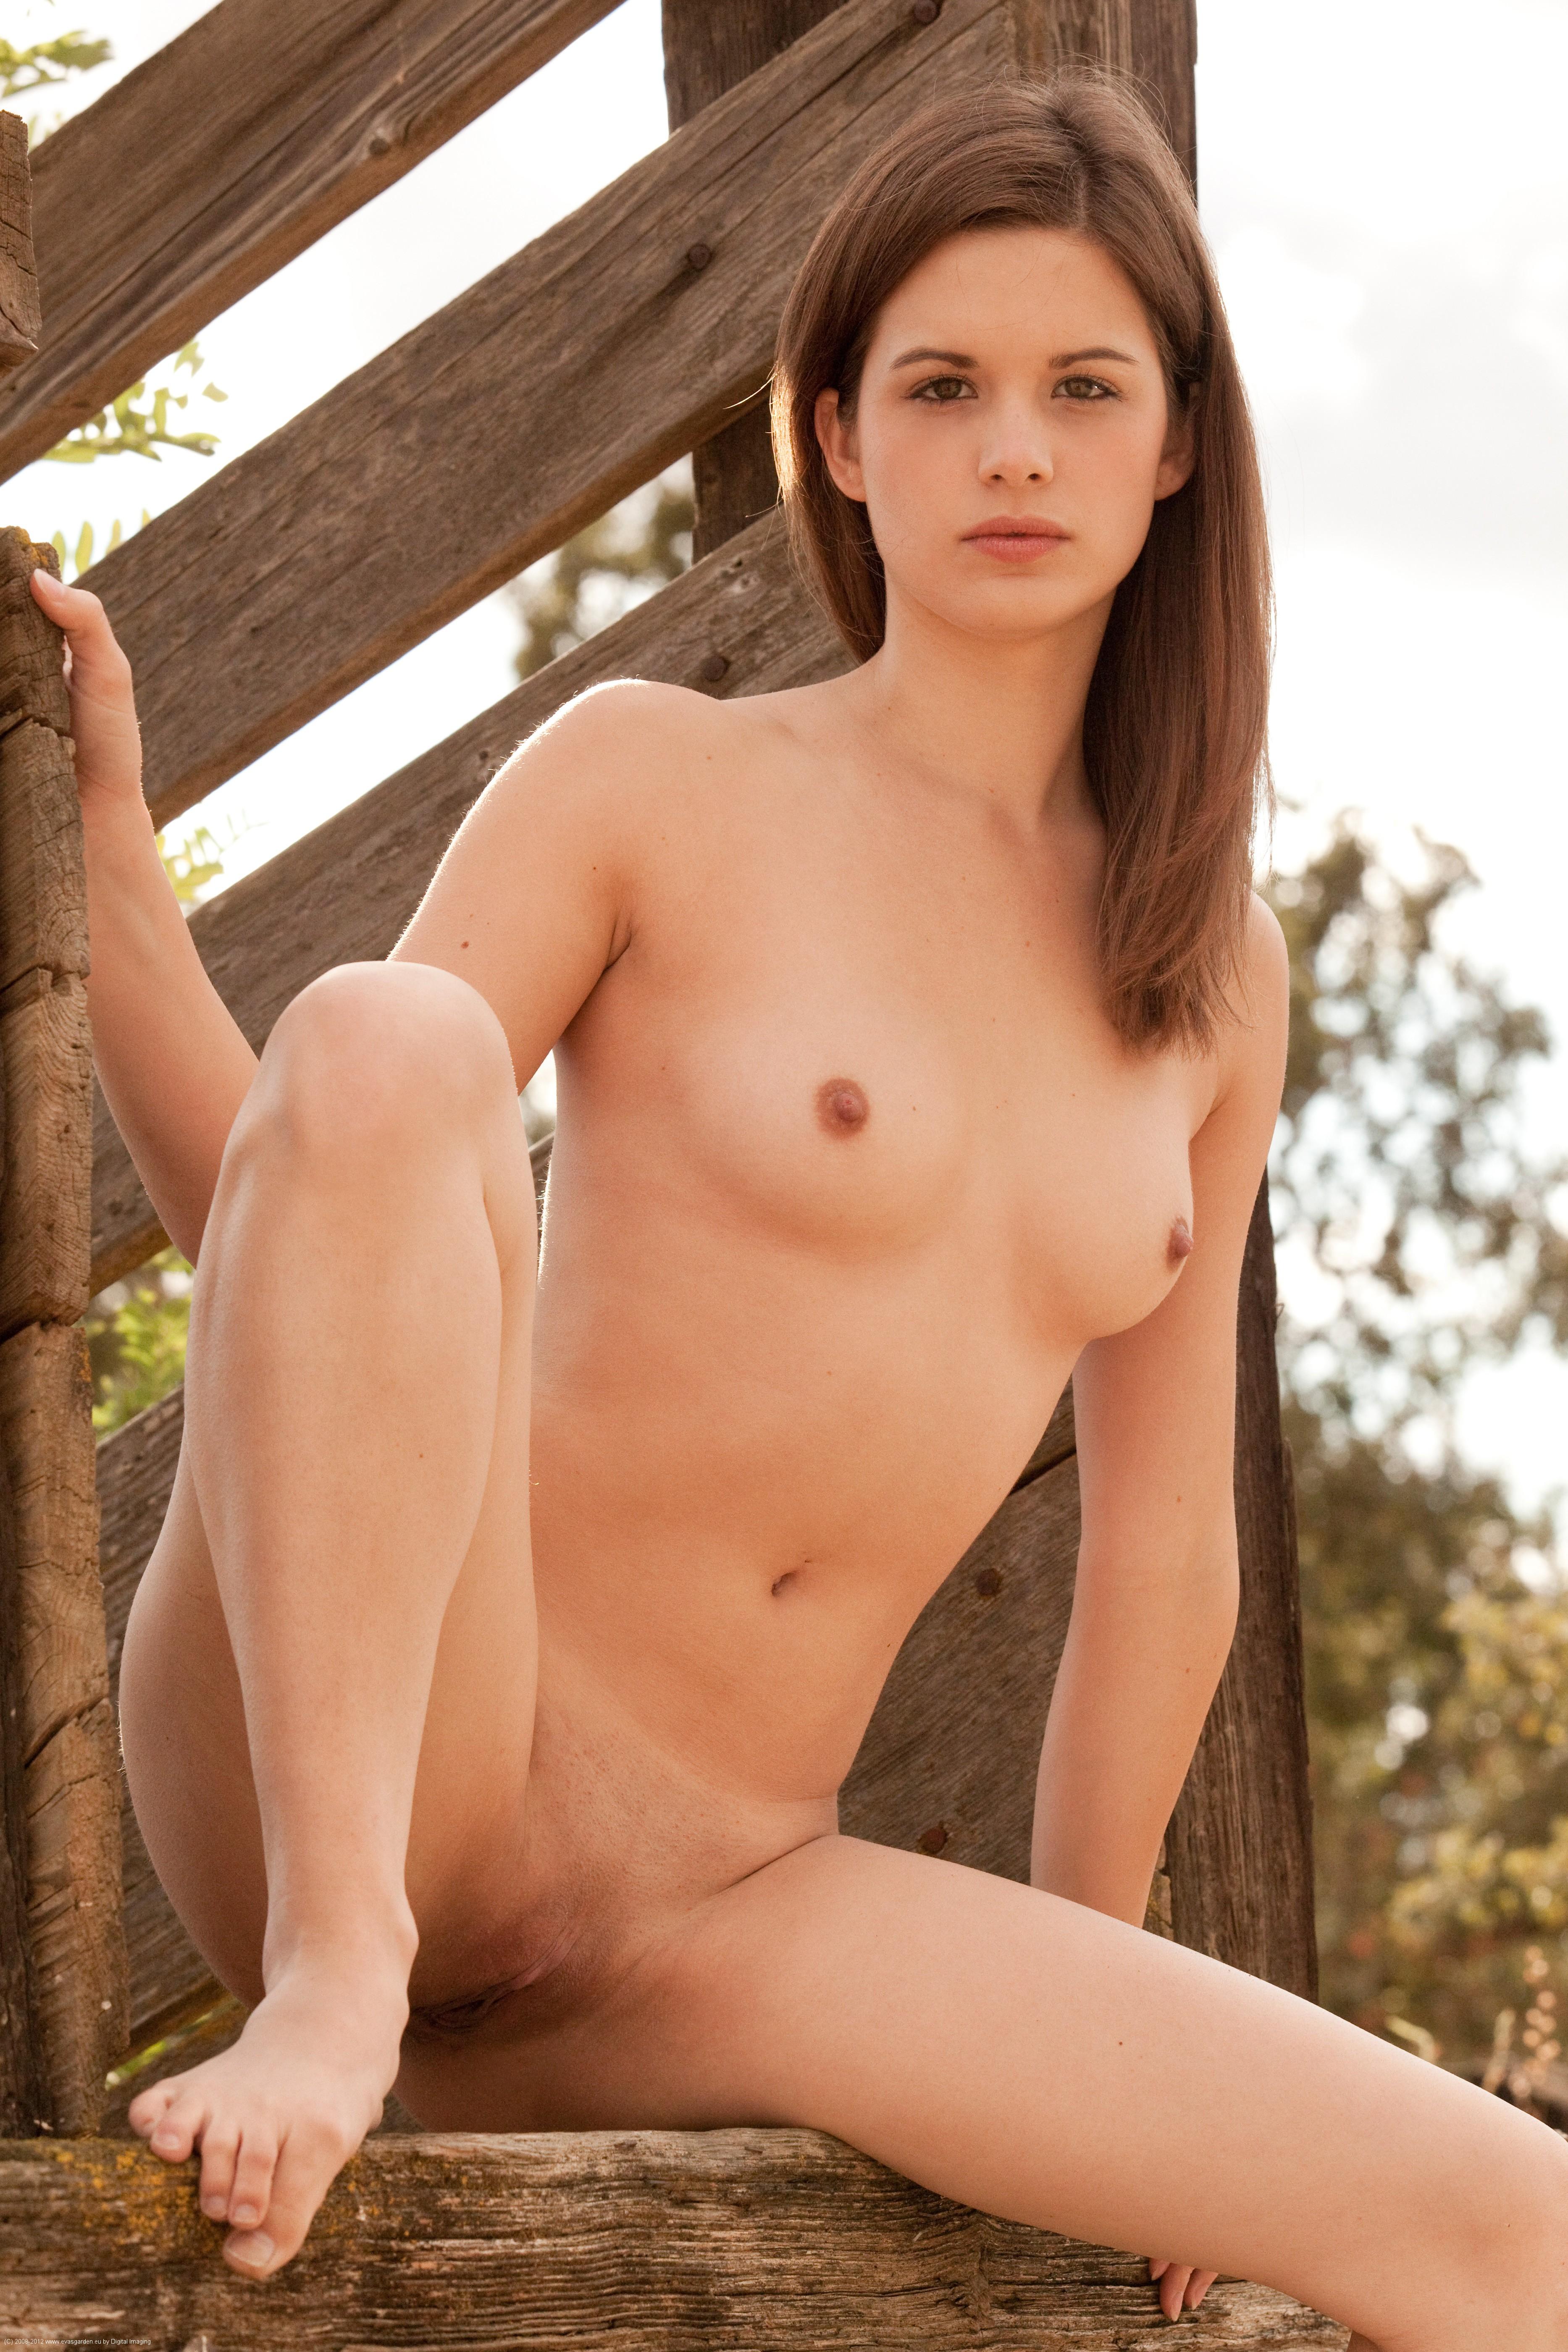 turboimagehost.com imagesize:1440x960piss porn cows ramp klarys mulligan 5600 x 3733 059